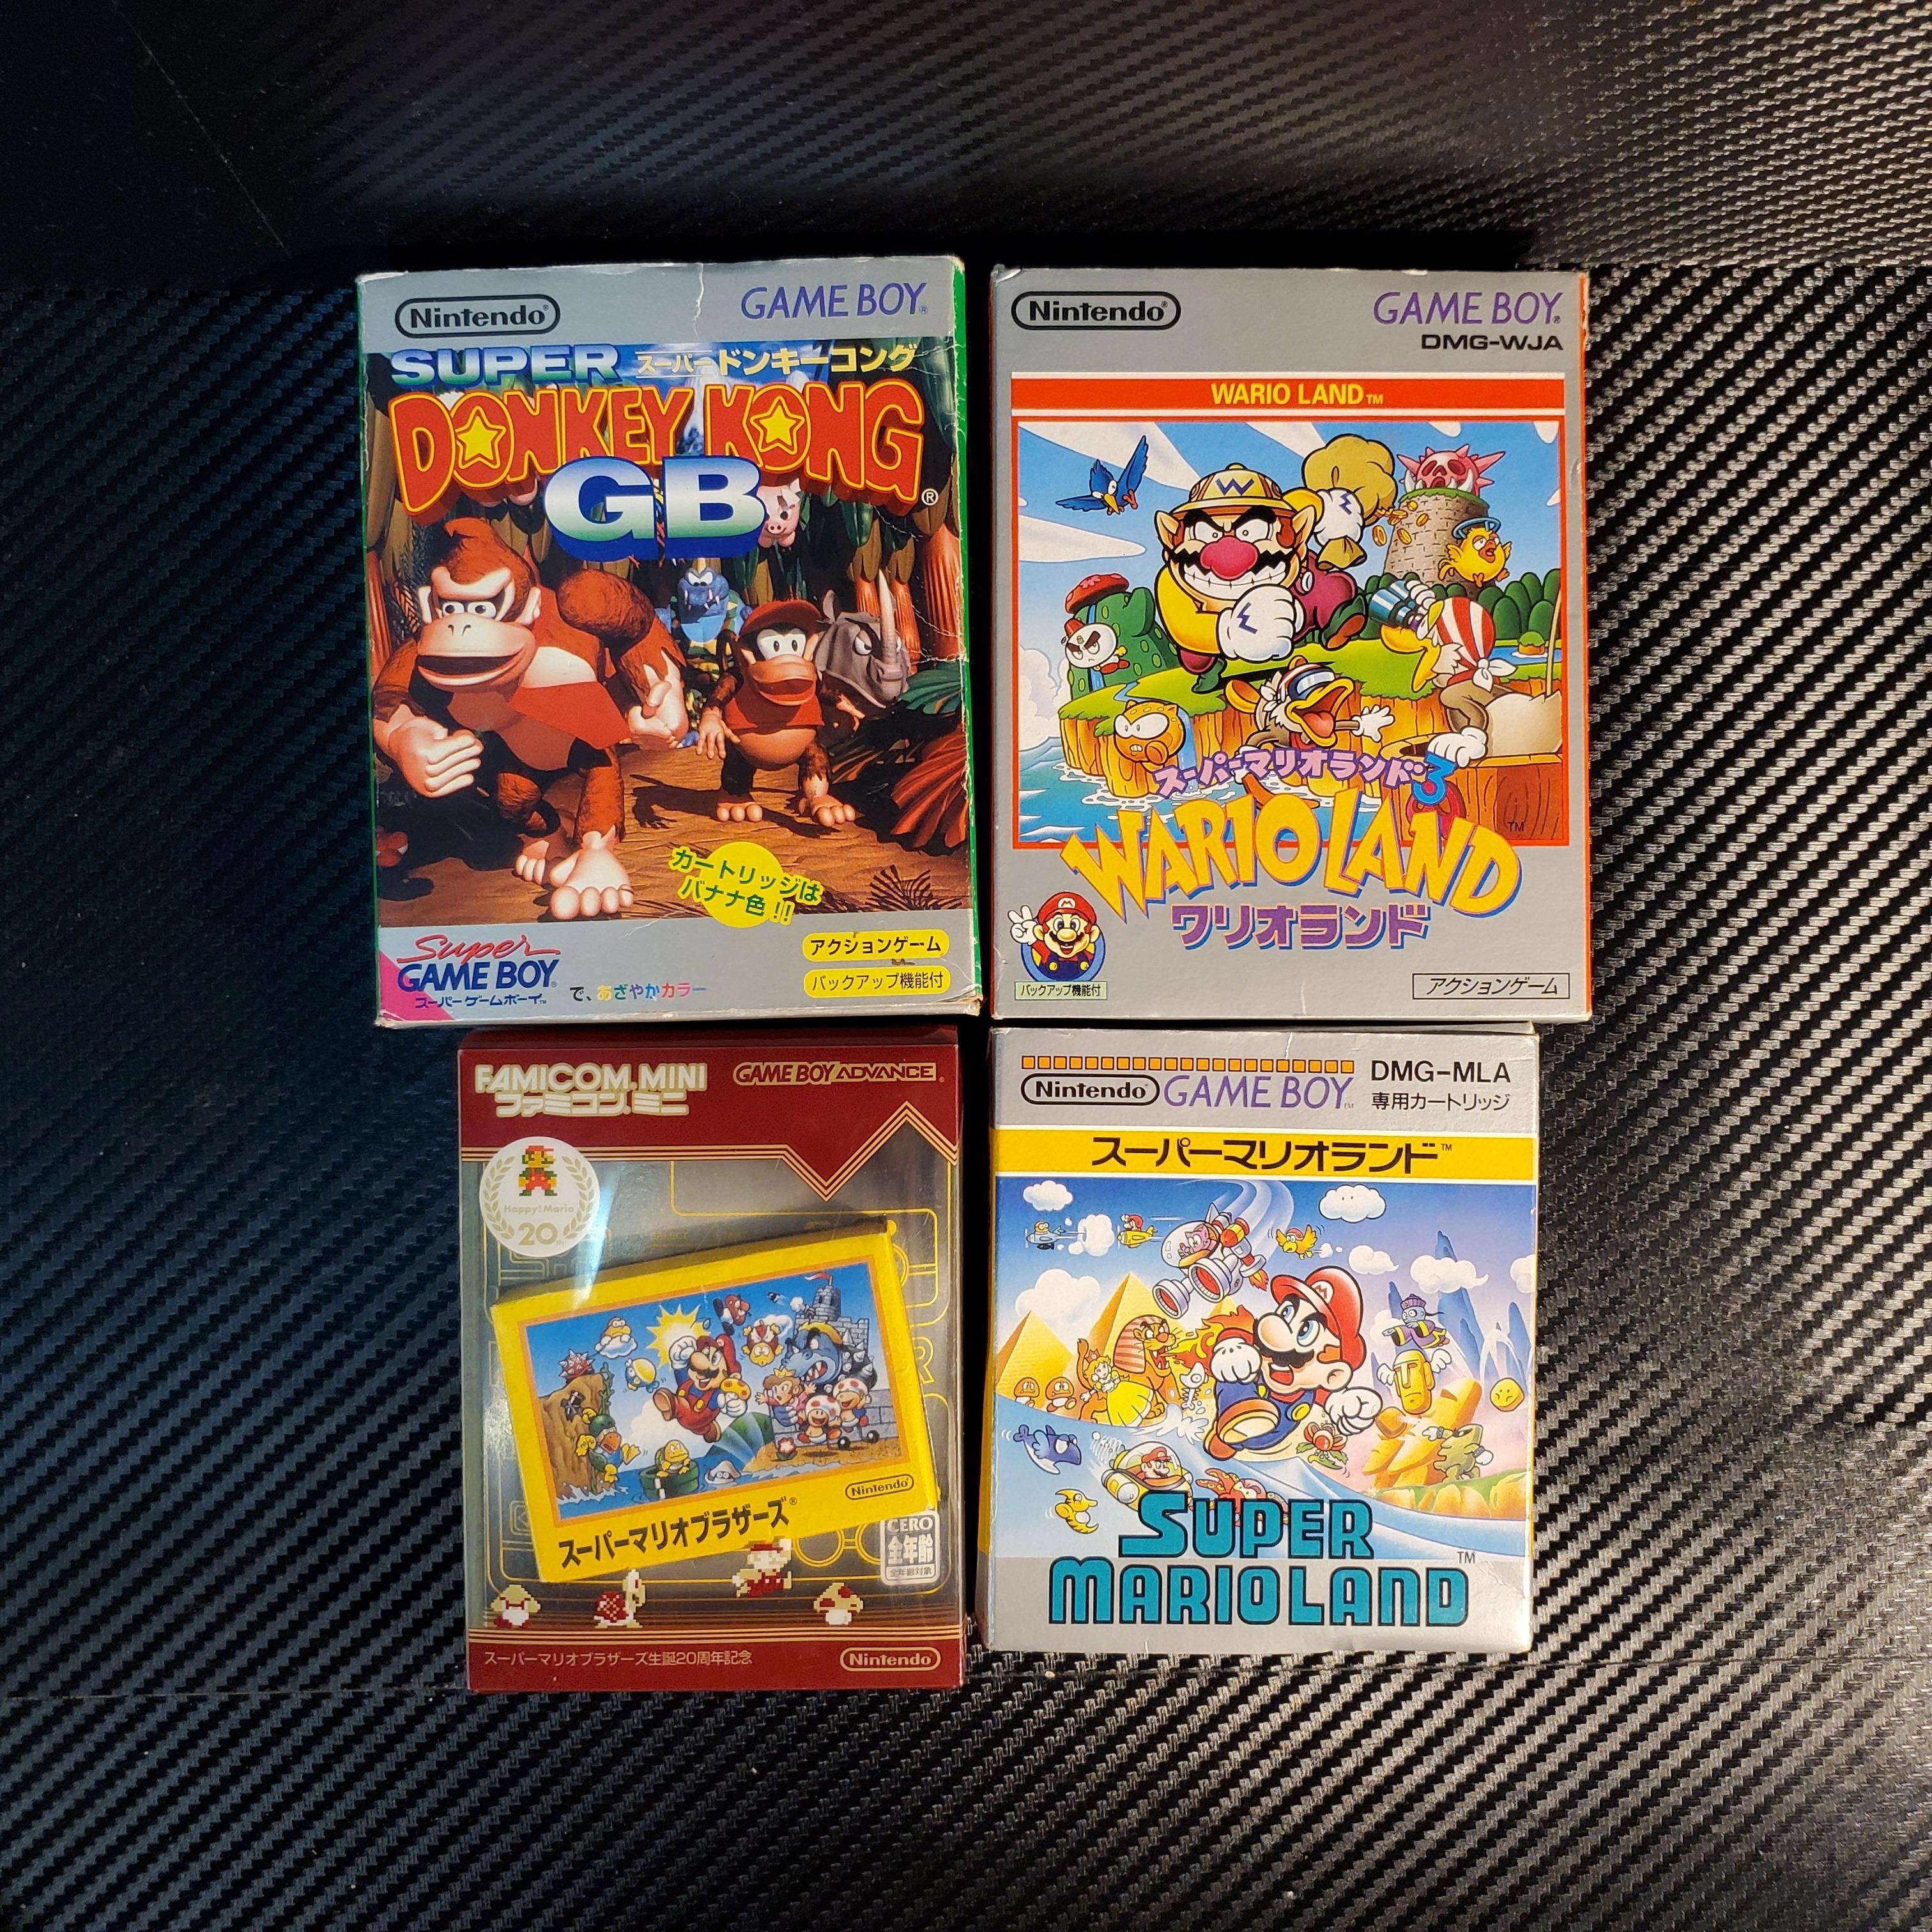 [VDS] Nostalgeek Store — Super Famicom / GBA / GB / Nintendo 64 / GameCube 201005105108434548